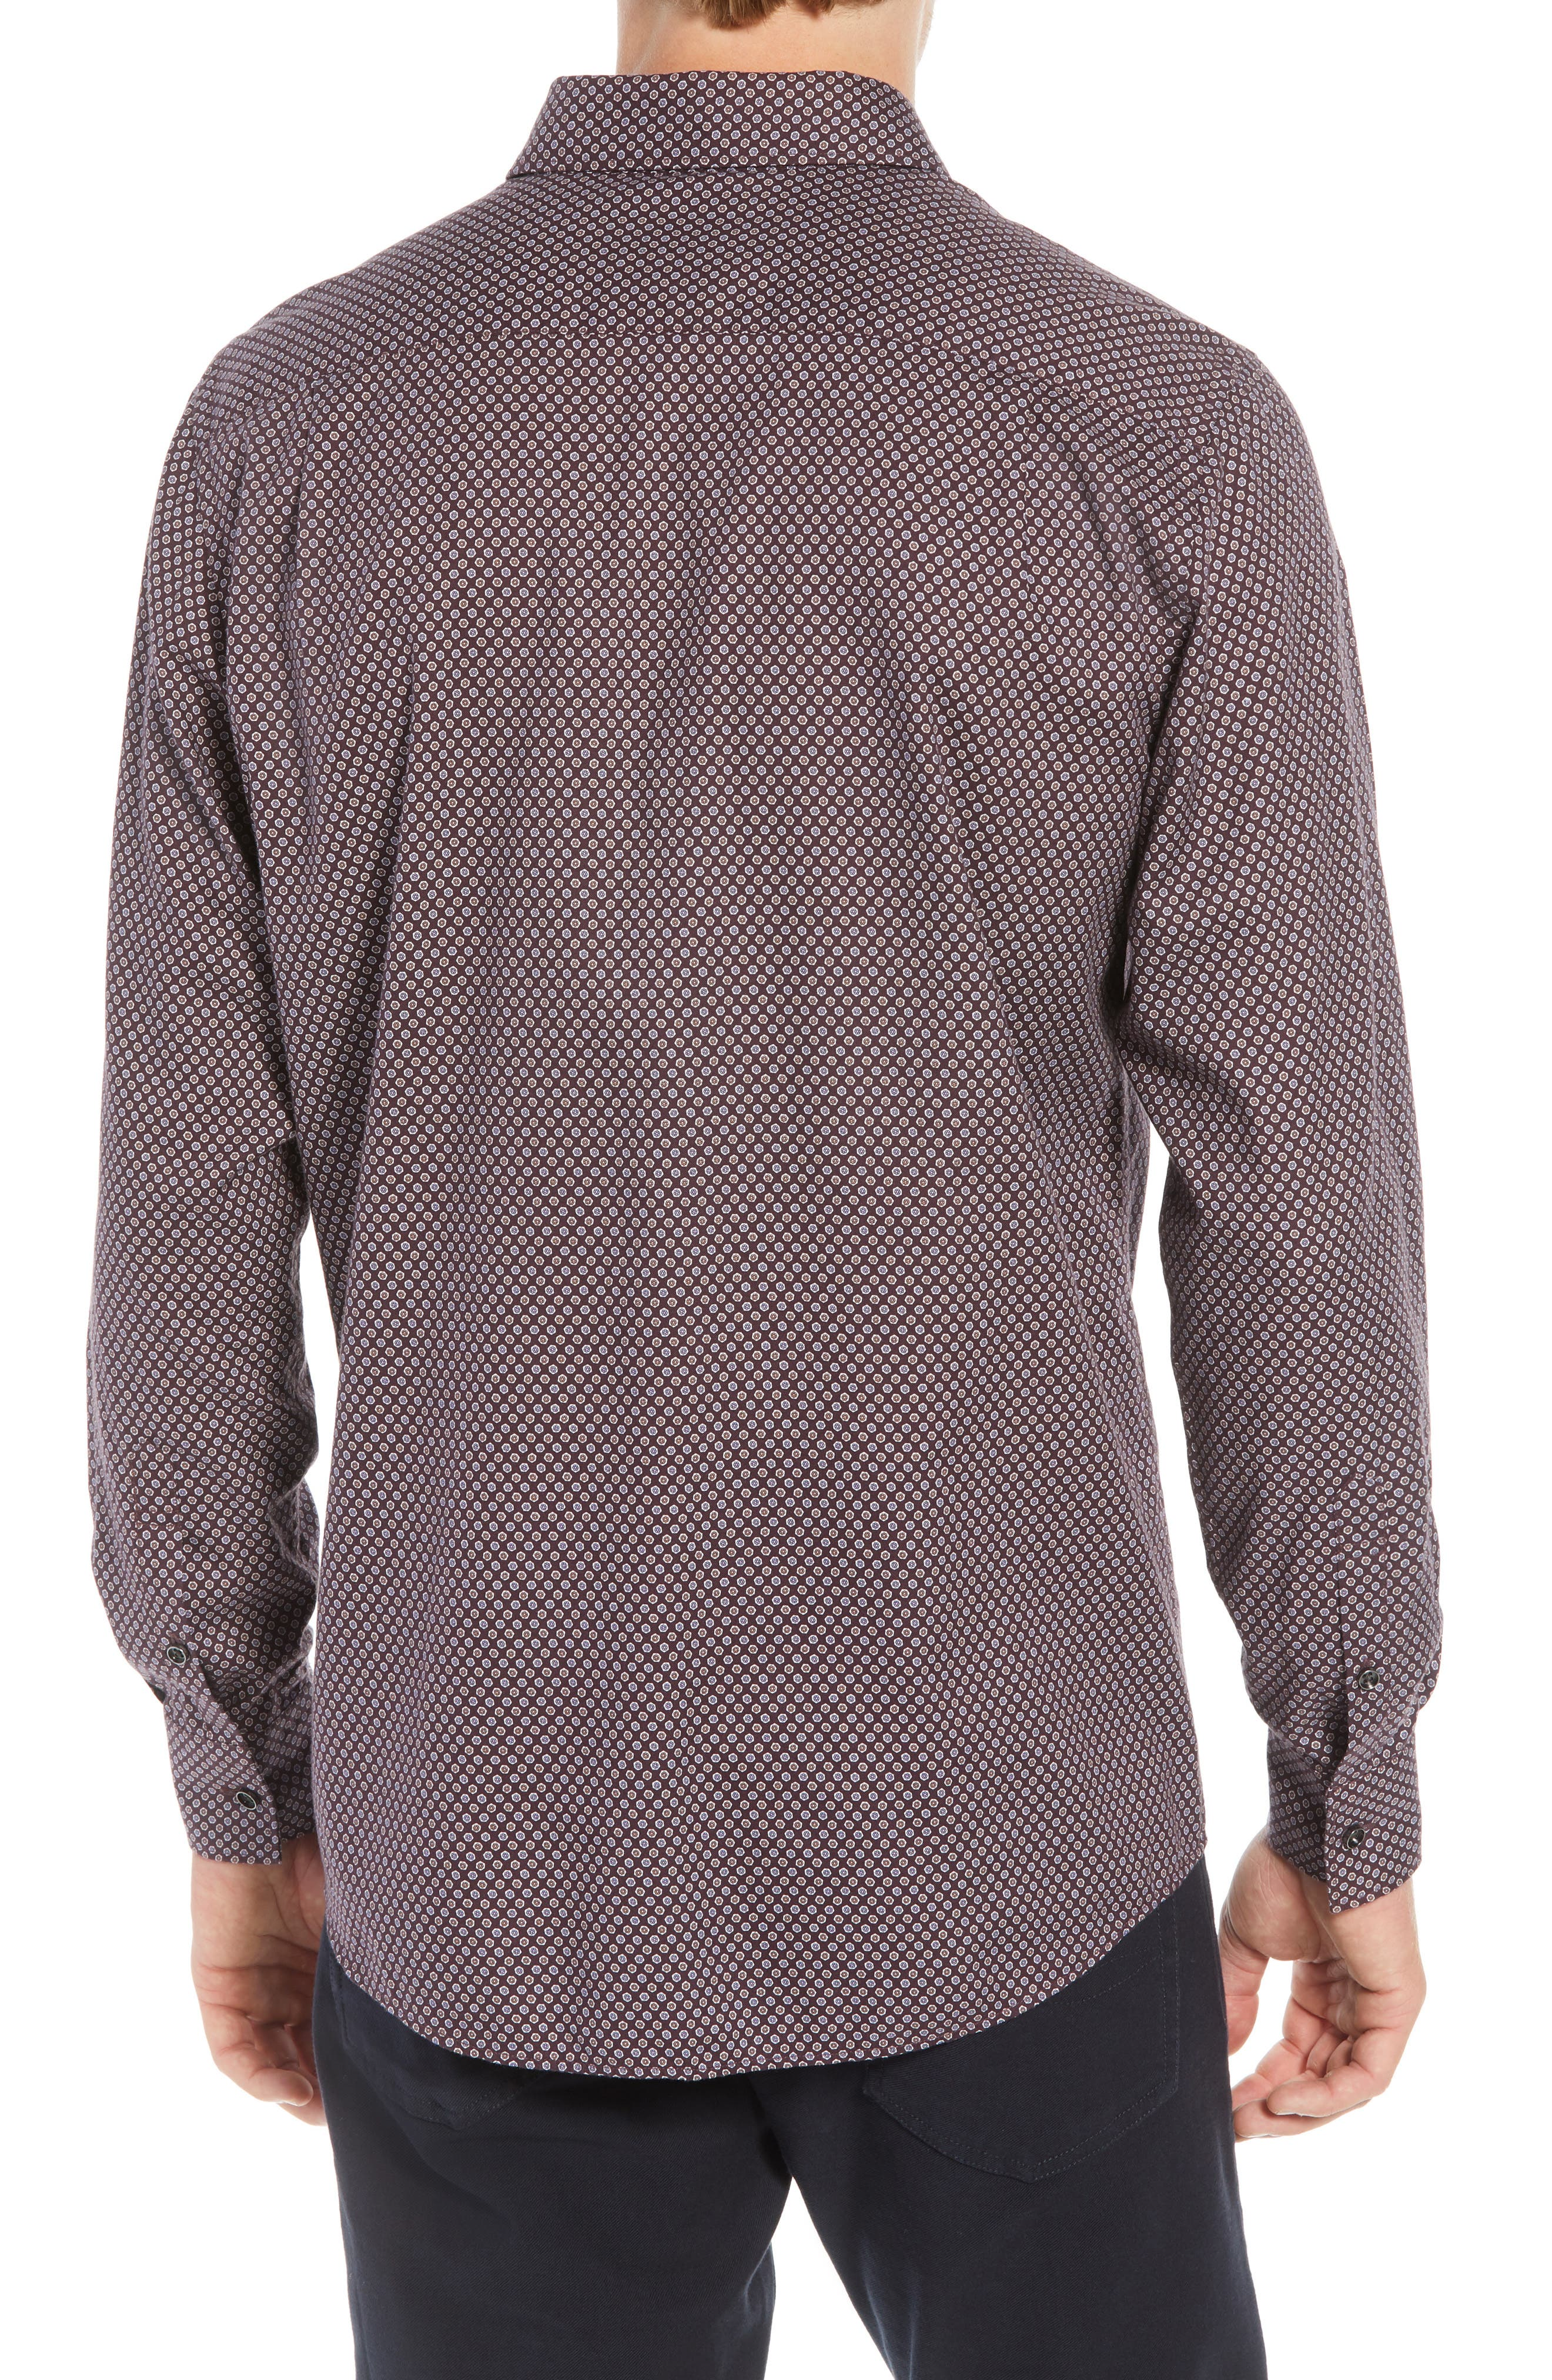 Marsden Bay Regular Fit Sport Shirt,                             Alternate thumbnail 3, color,                             BORDEAUX